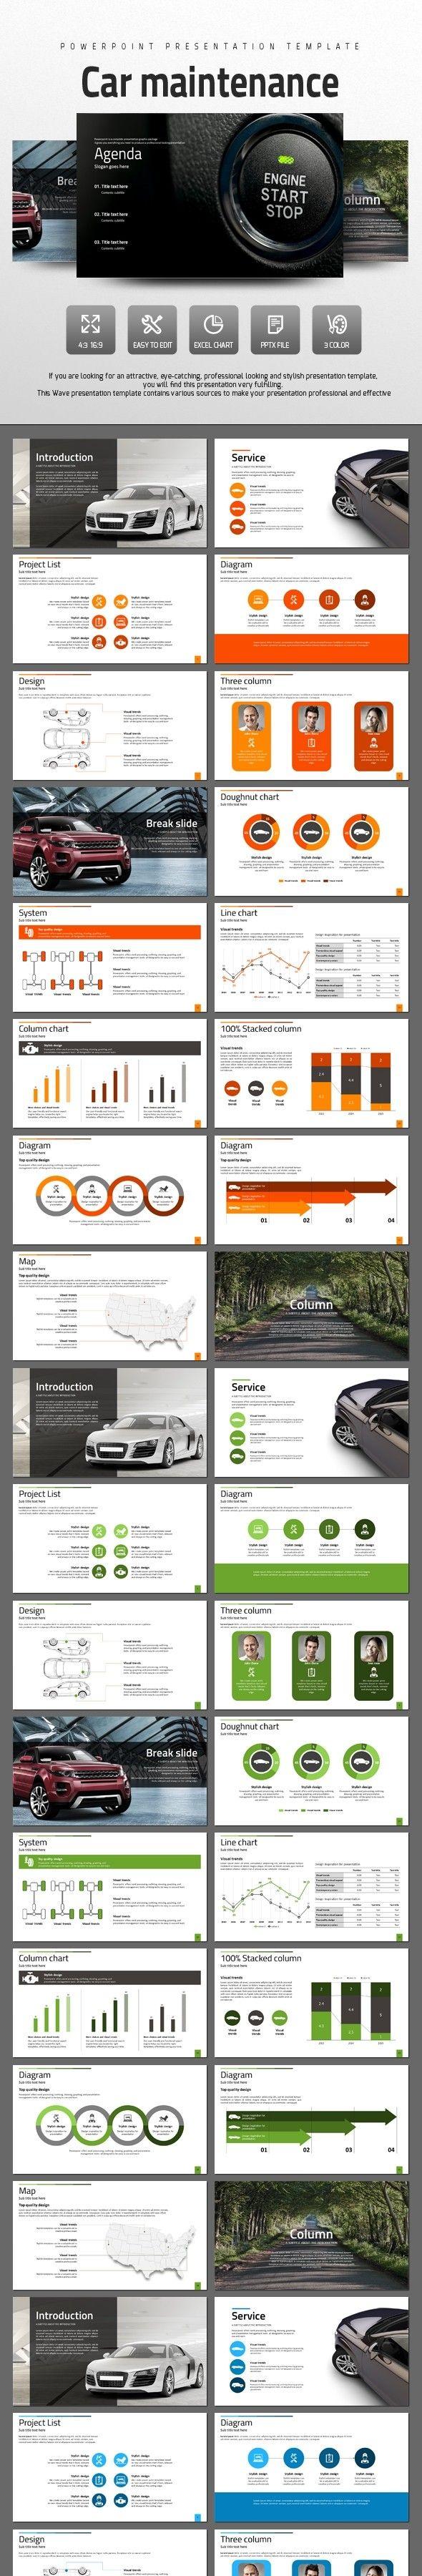 Animated Powerpoint Presentation, Animated Presentation Template, Animated  Template, Automobile, Car, Car